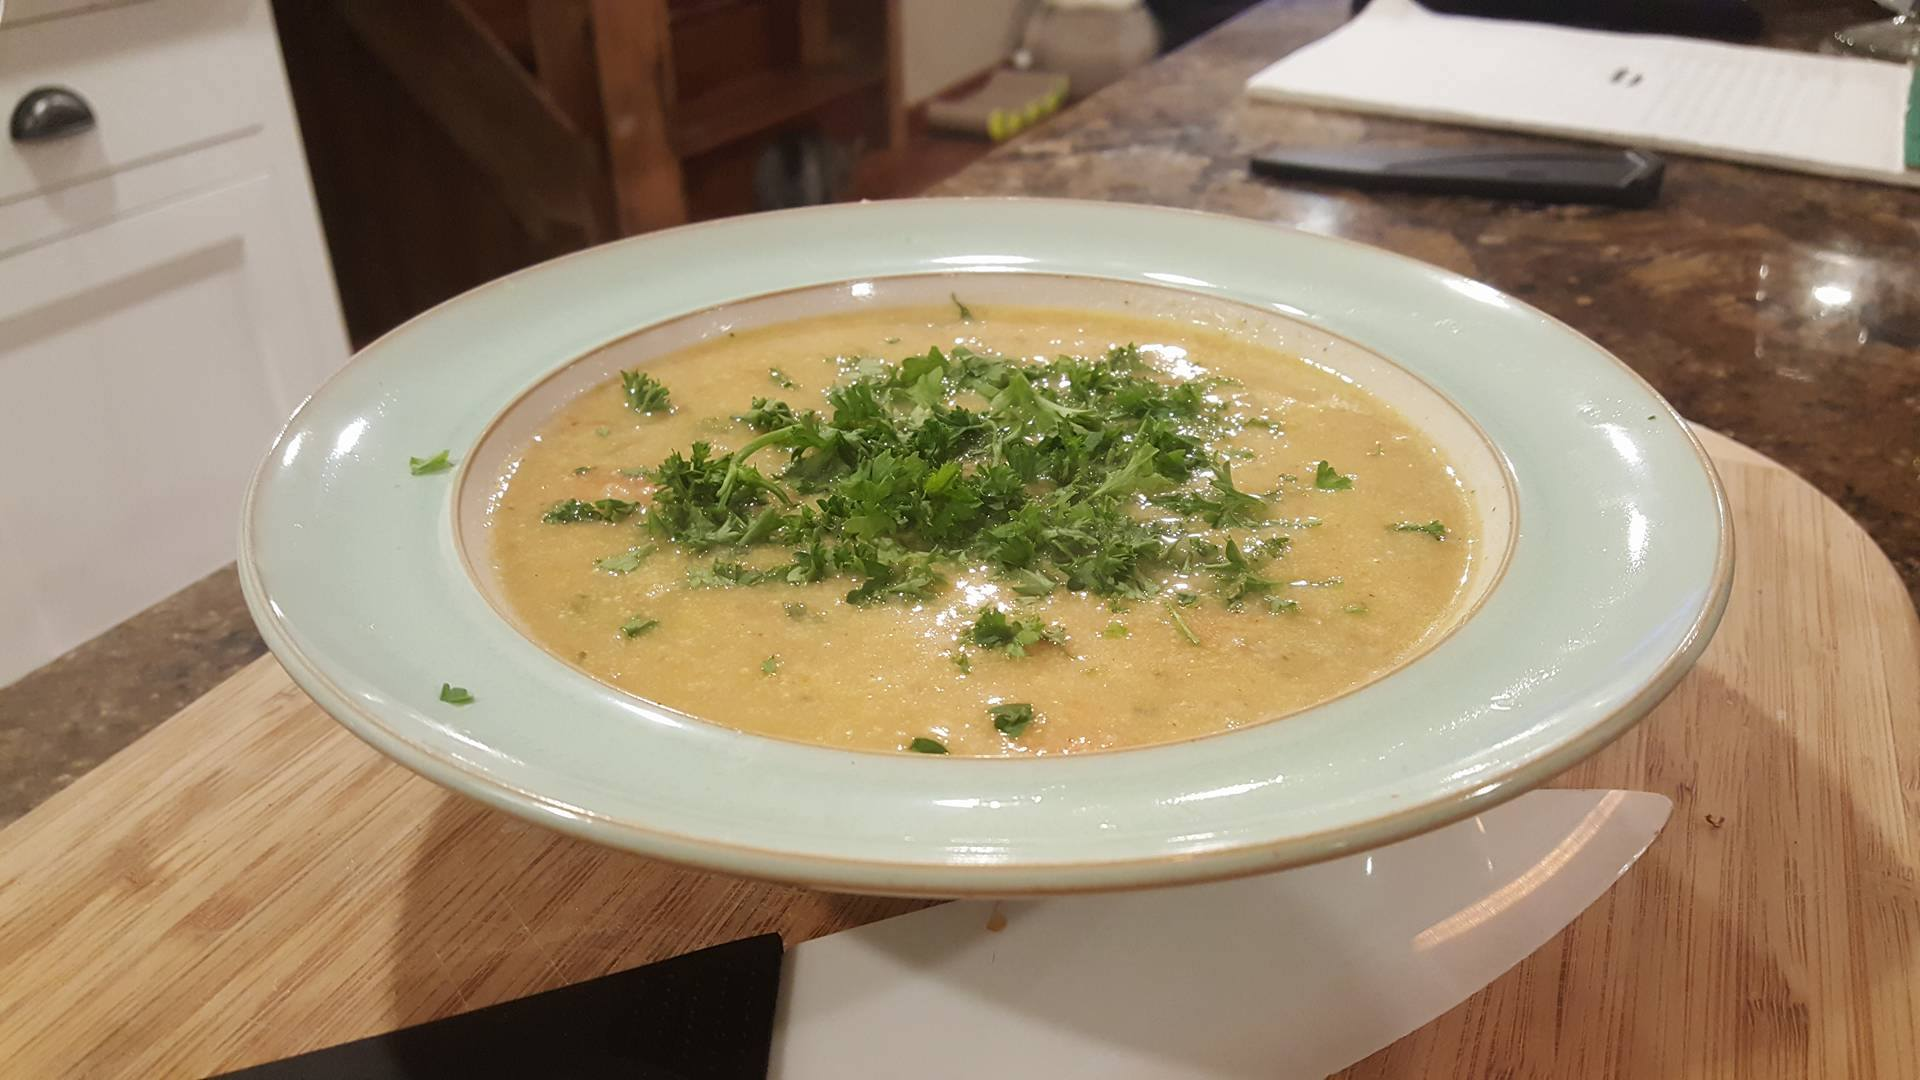 Creamy Potato and Carrot Soup with Quinoa